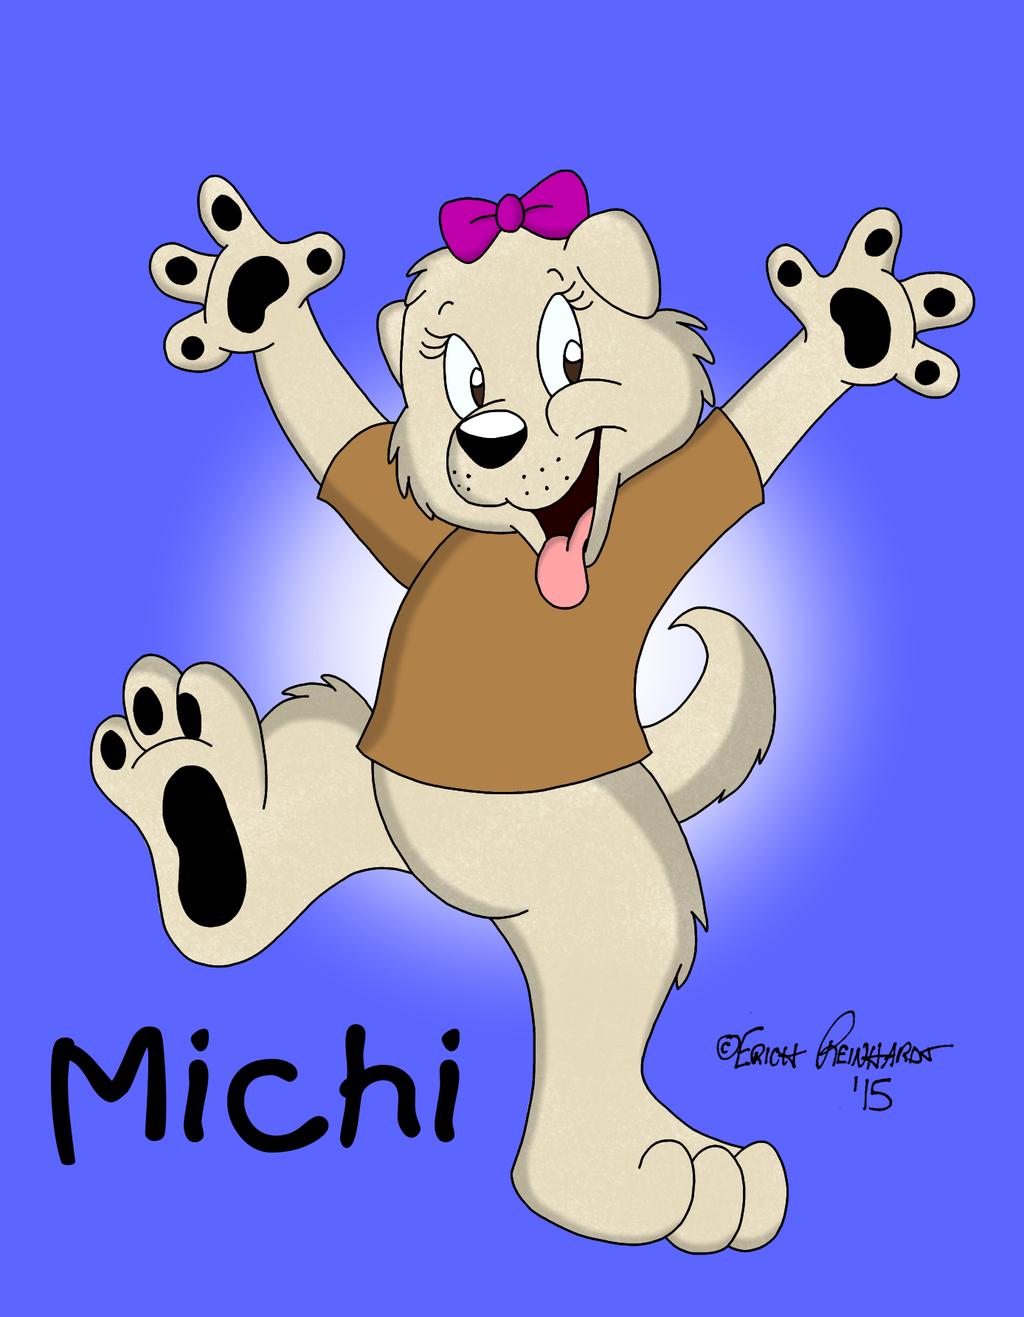 Meet Michi!